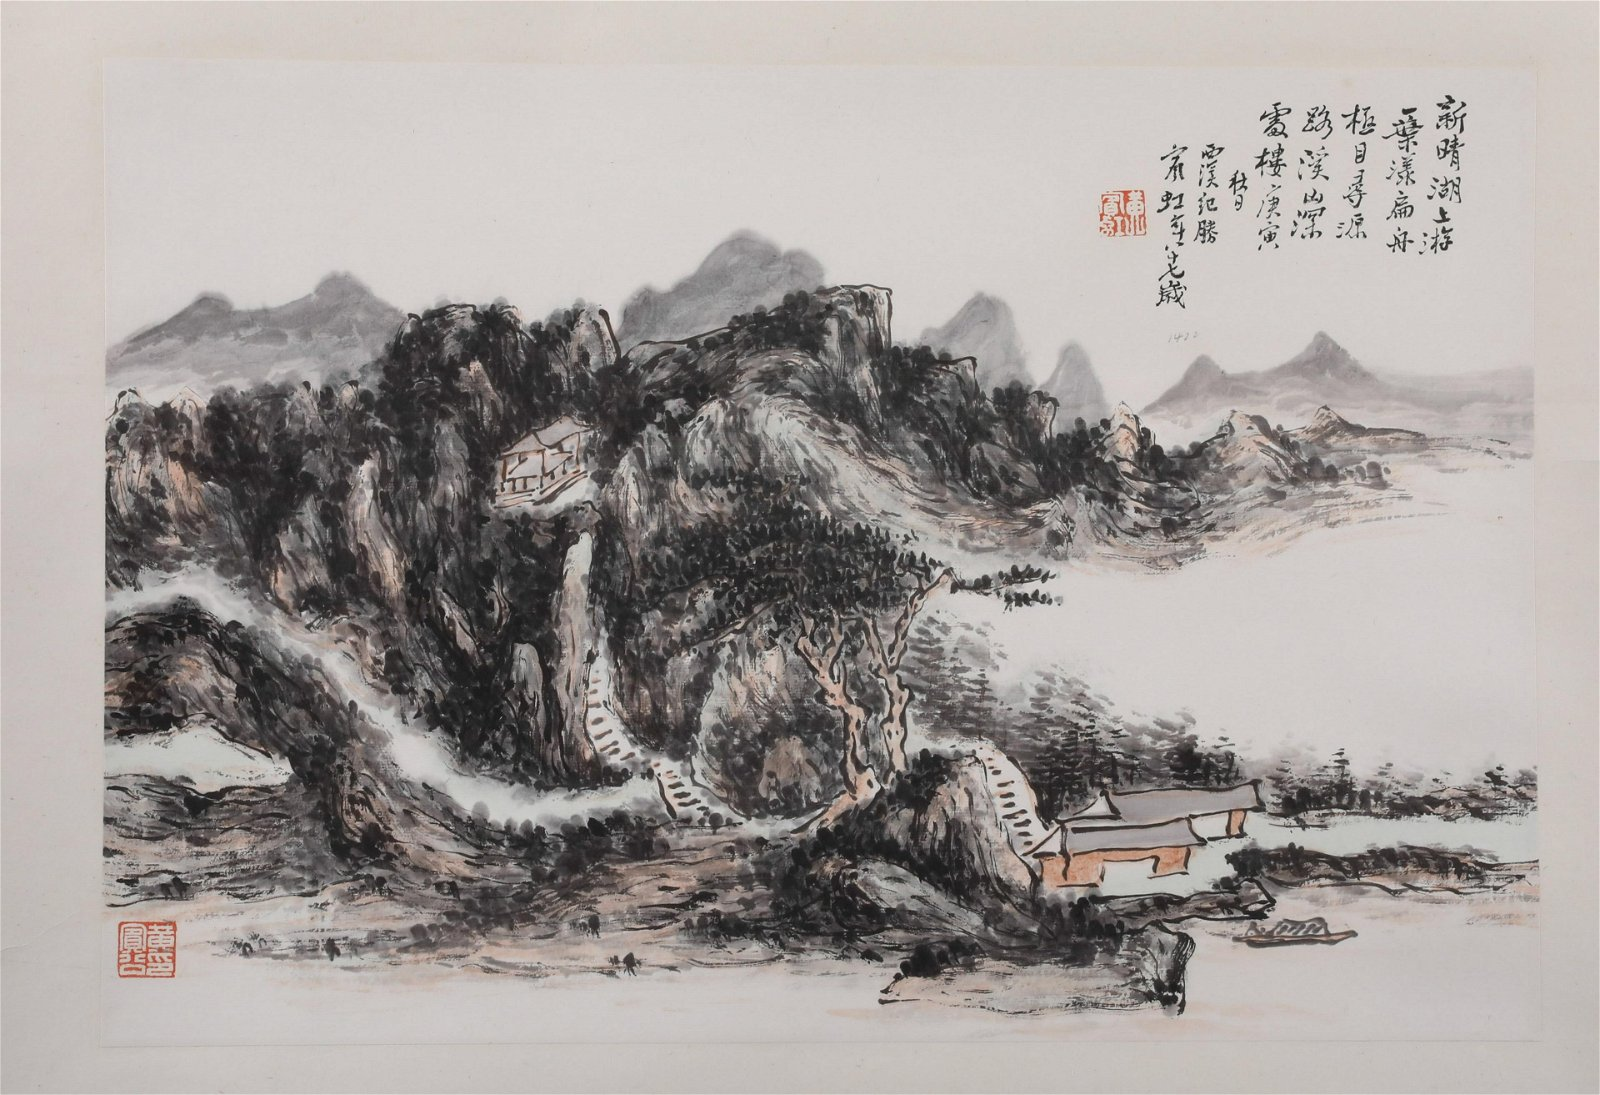 Chinese Hand-drawn Painting Signed by Huang binhong